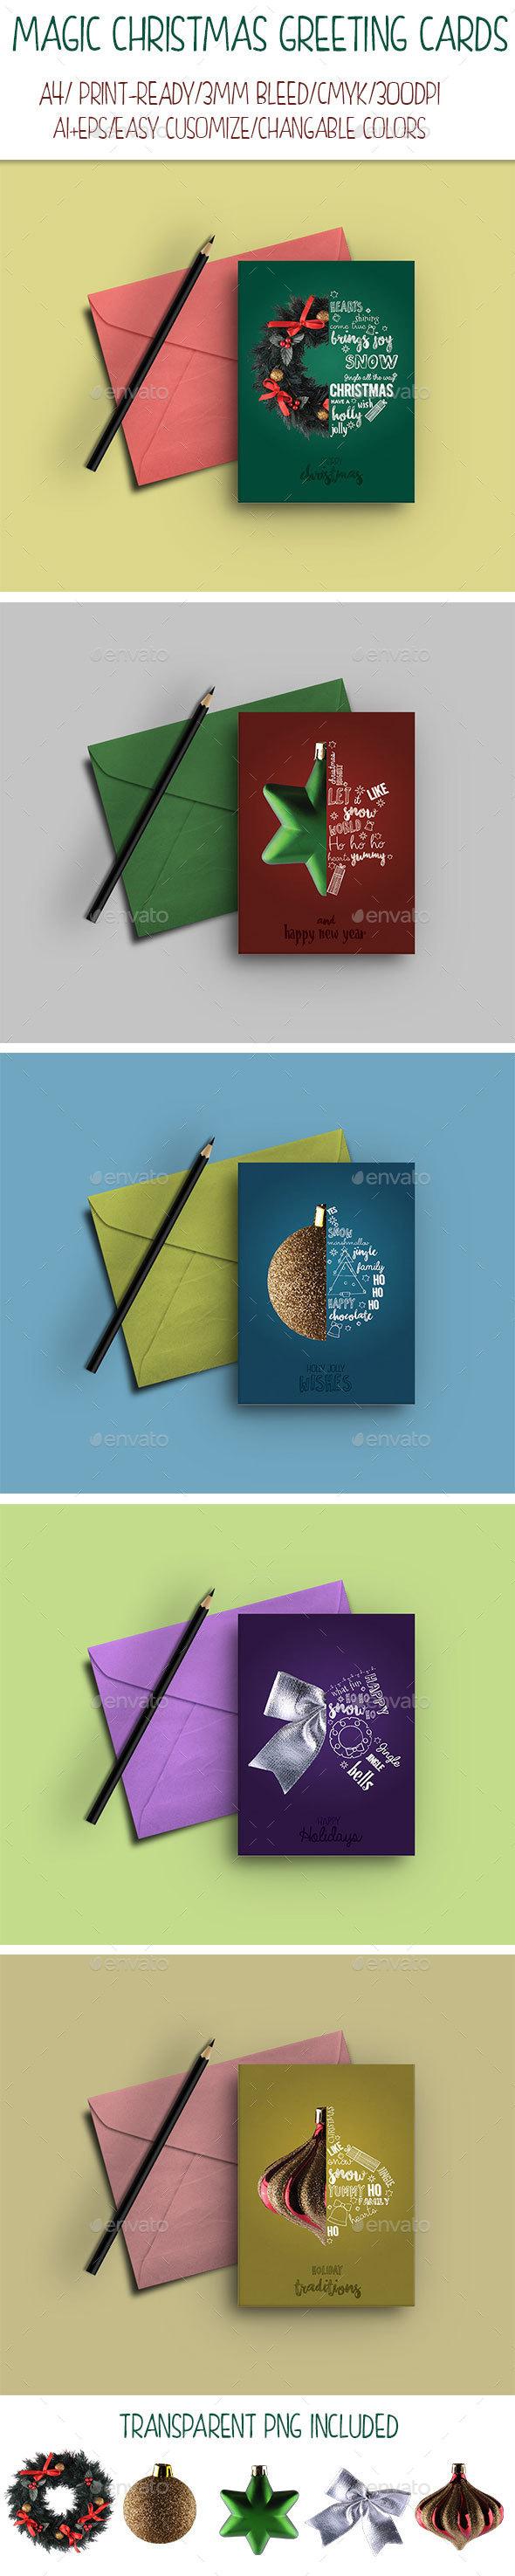 Magic Christmas Greeting Cards - Cards & Invites Print Templates